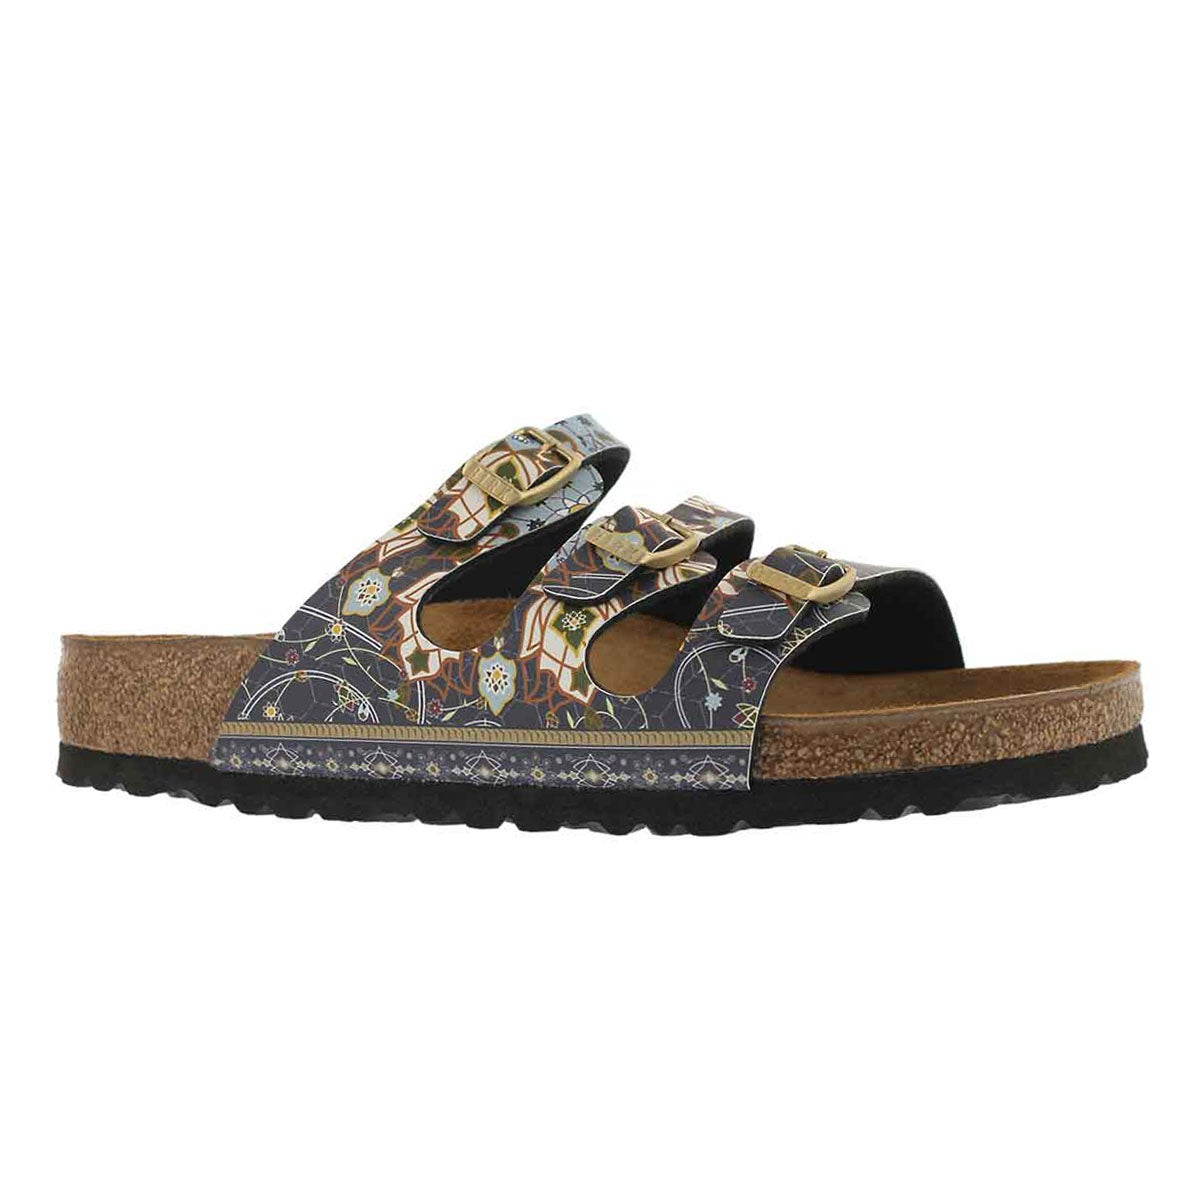 Women's FLORIDA BF ancient mosaic blu sandals